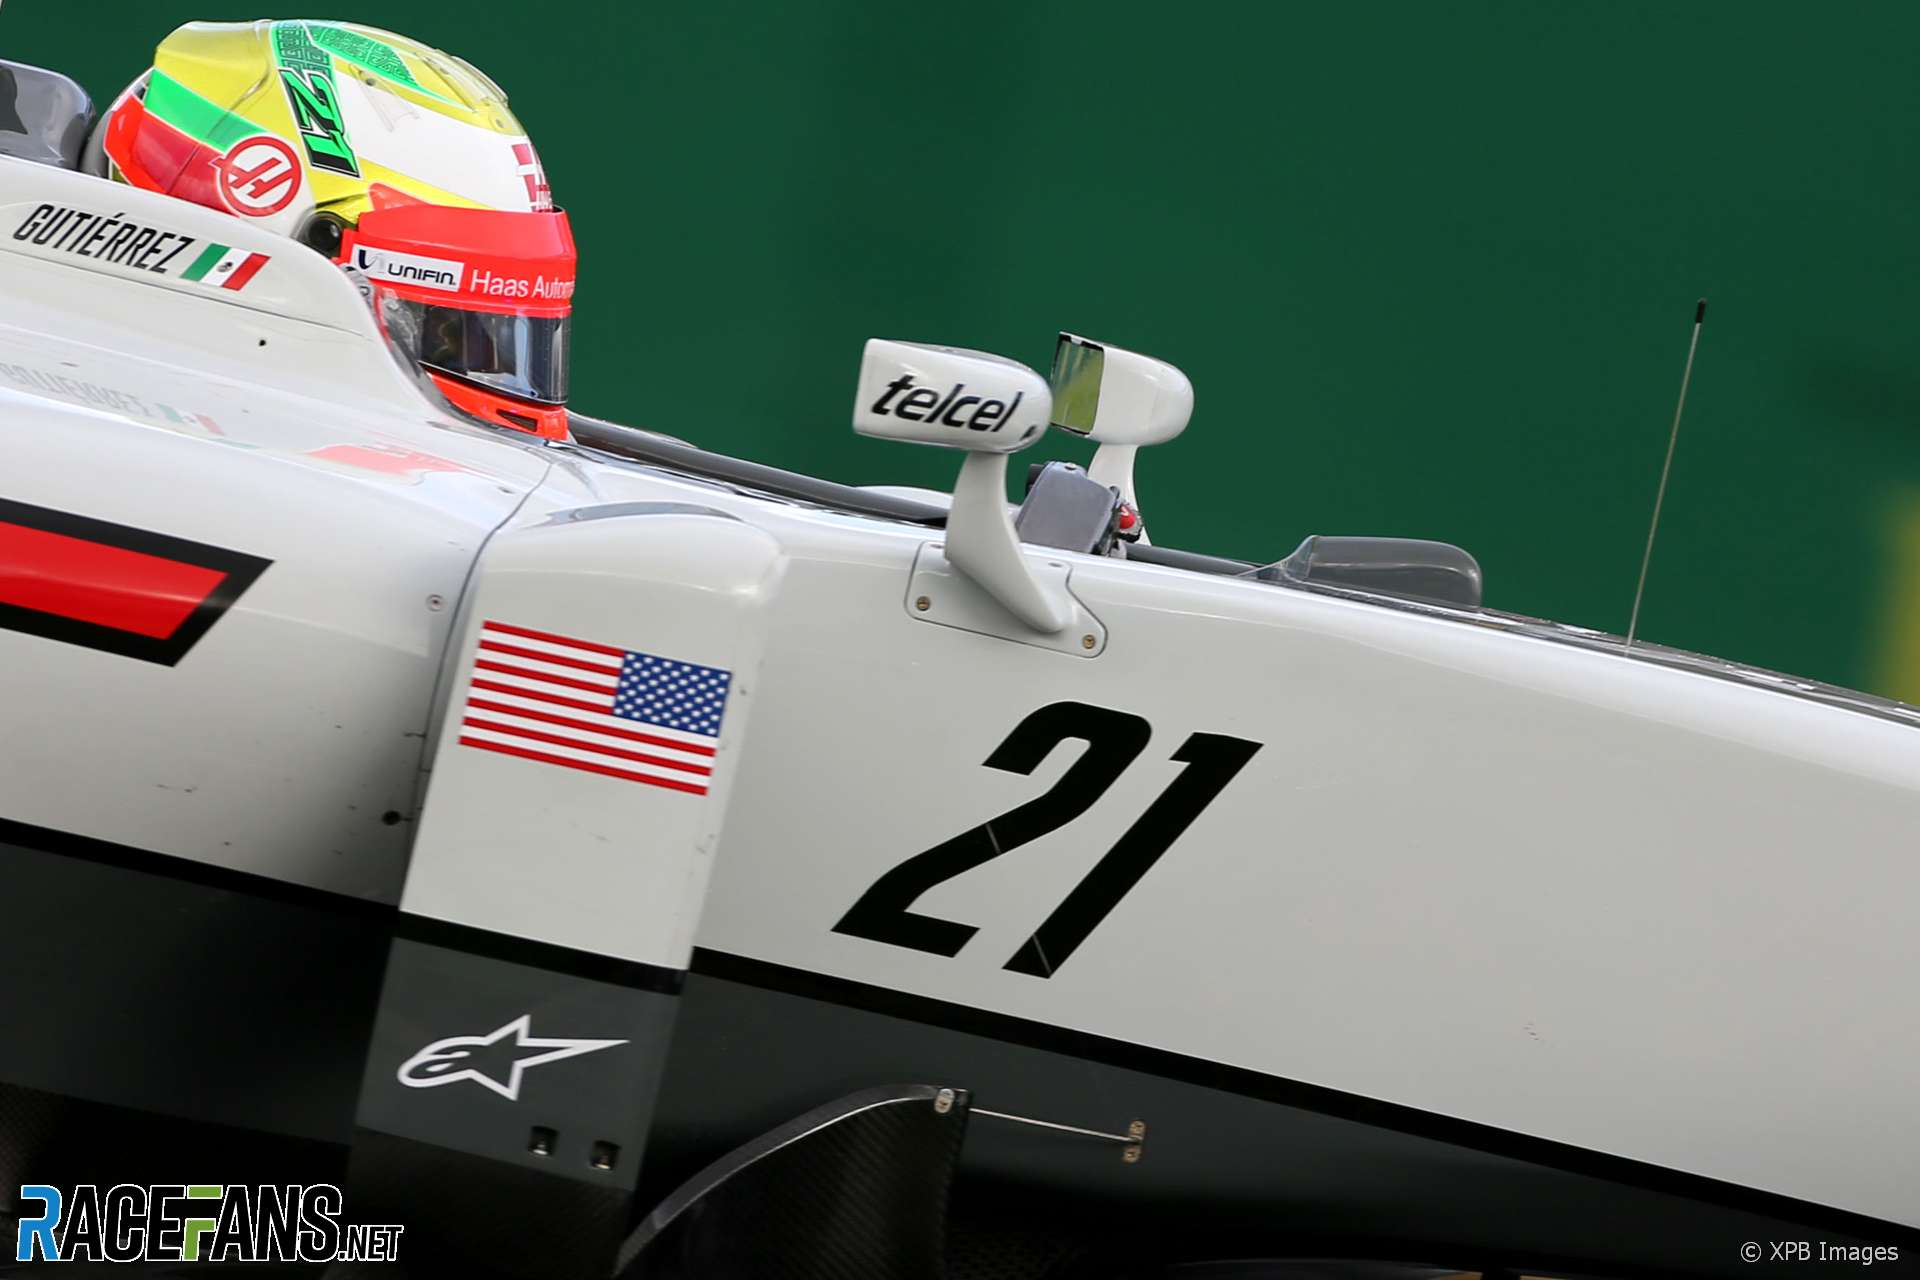 2021 F1 Season: Complete Formula 1 Championship Guide | Racefans